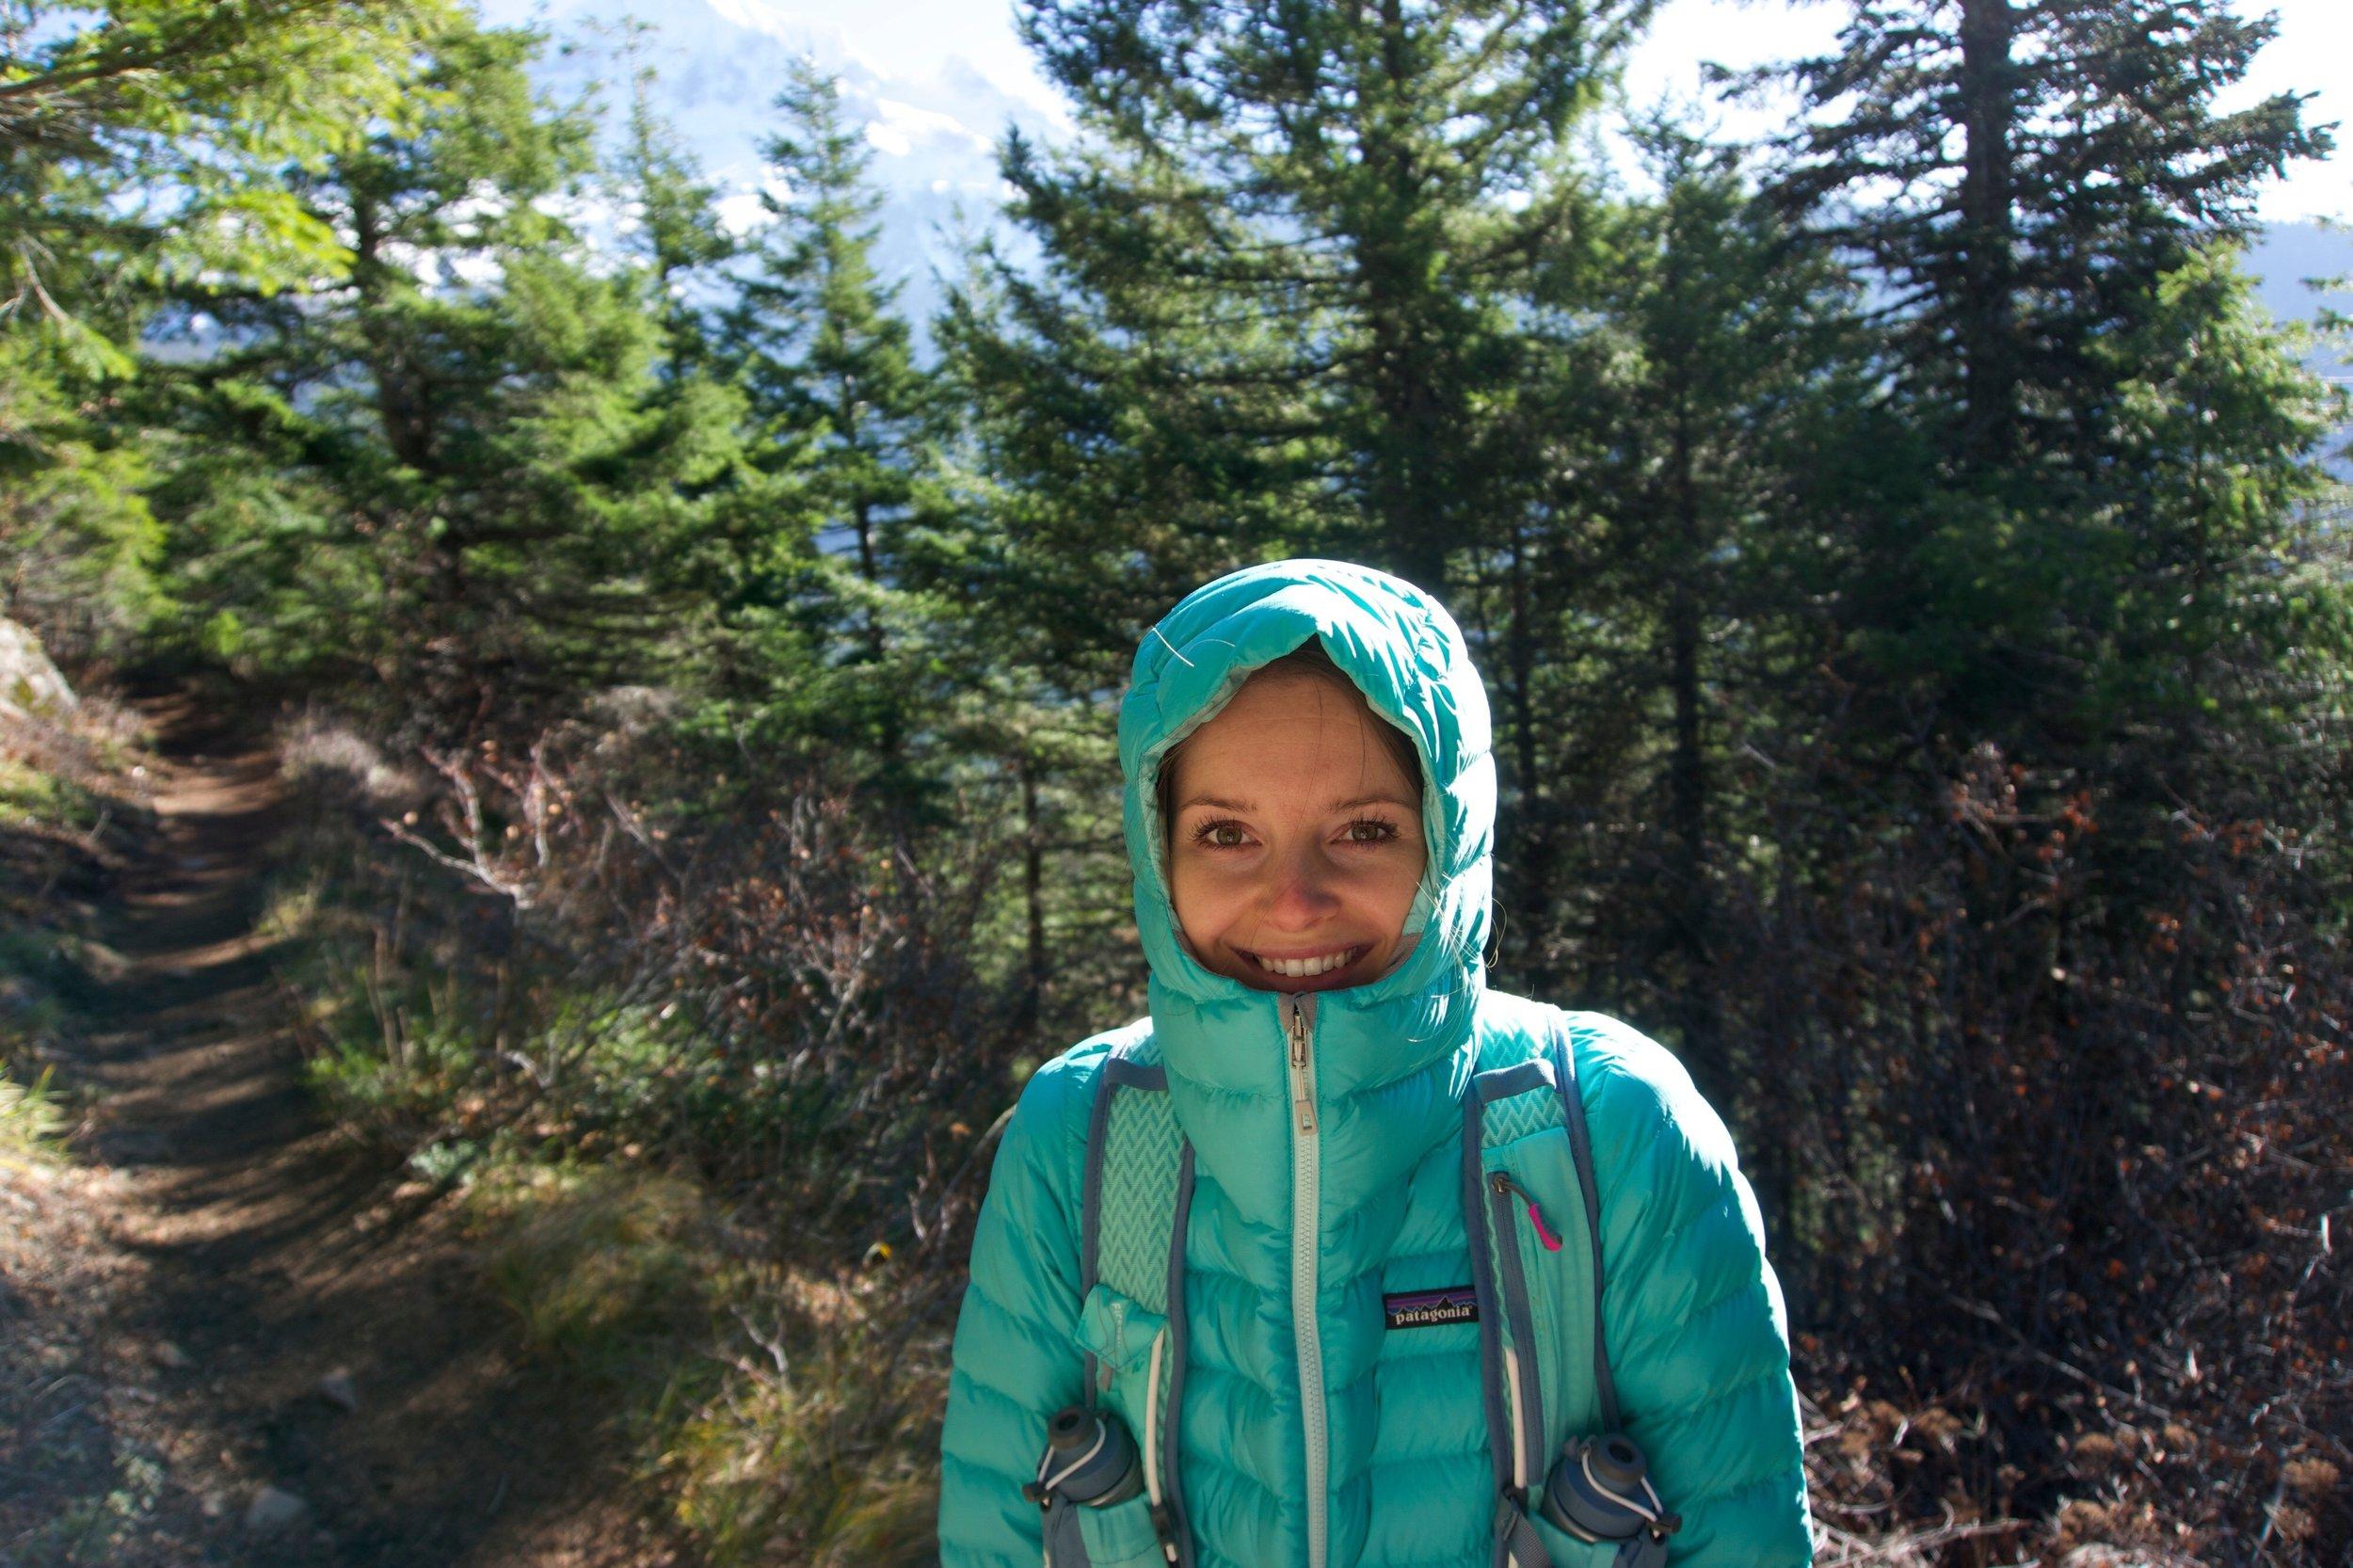 Timberline+Trail,+Mount+Hood+Wilderness,+Oregon (1).jpeg